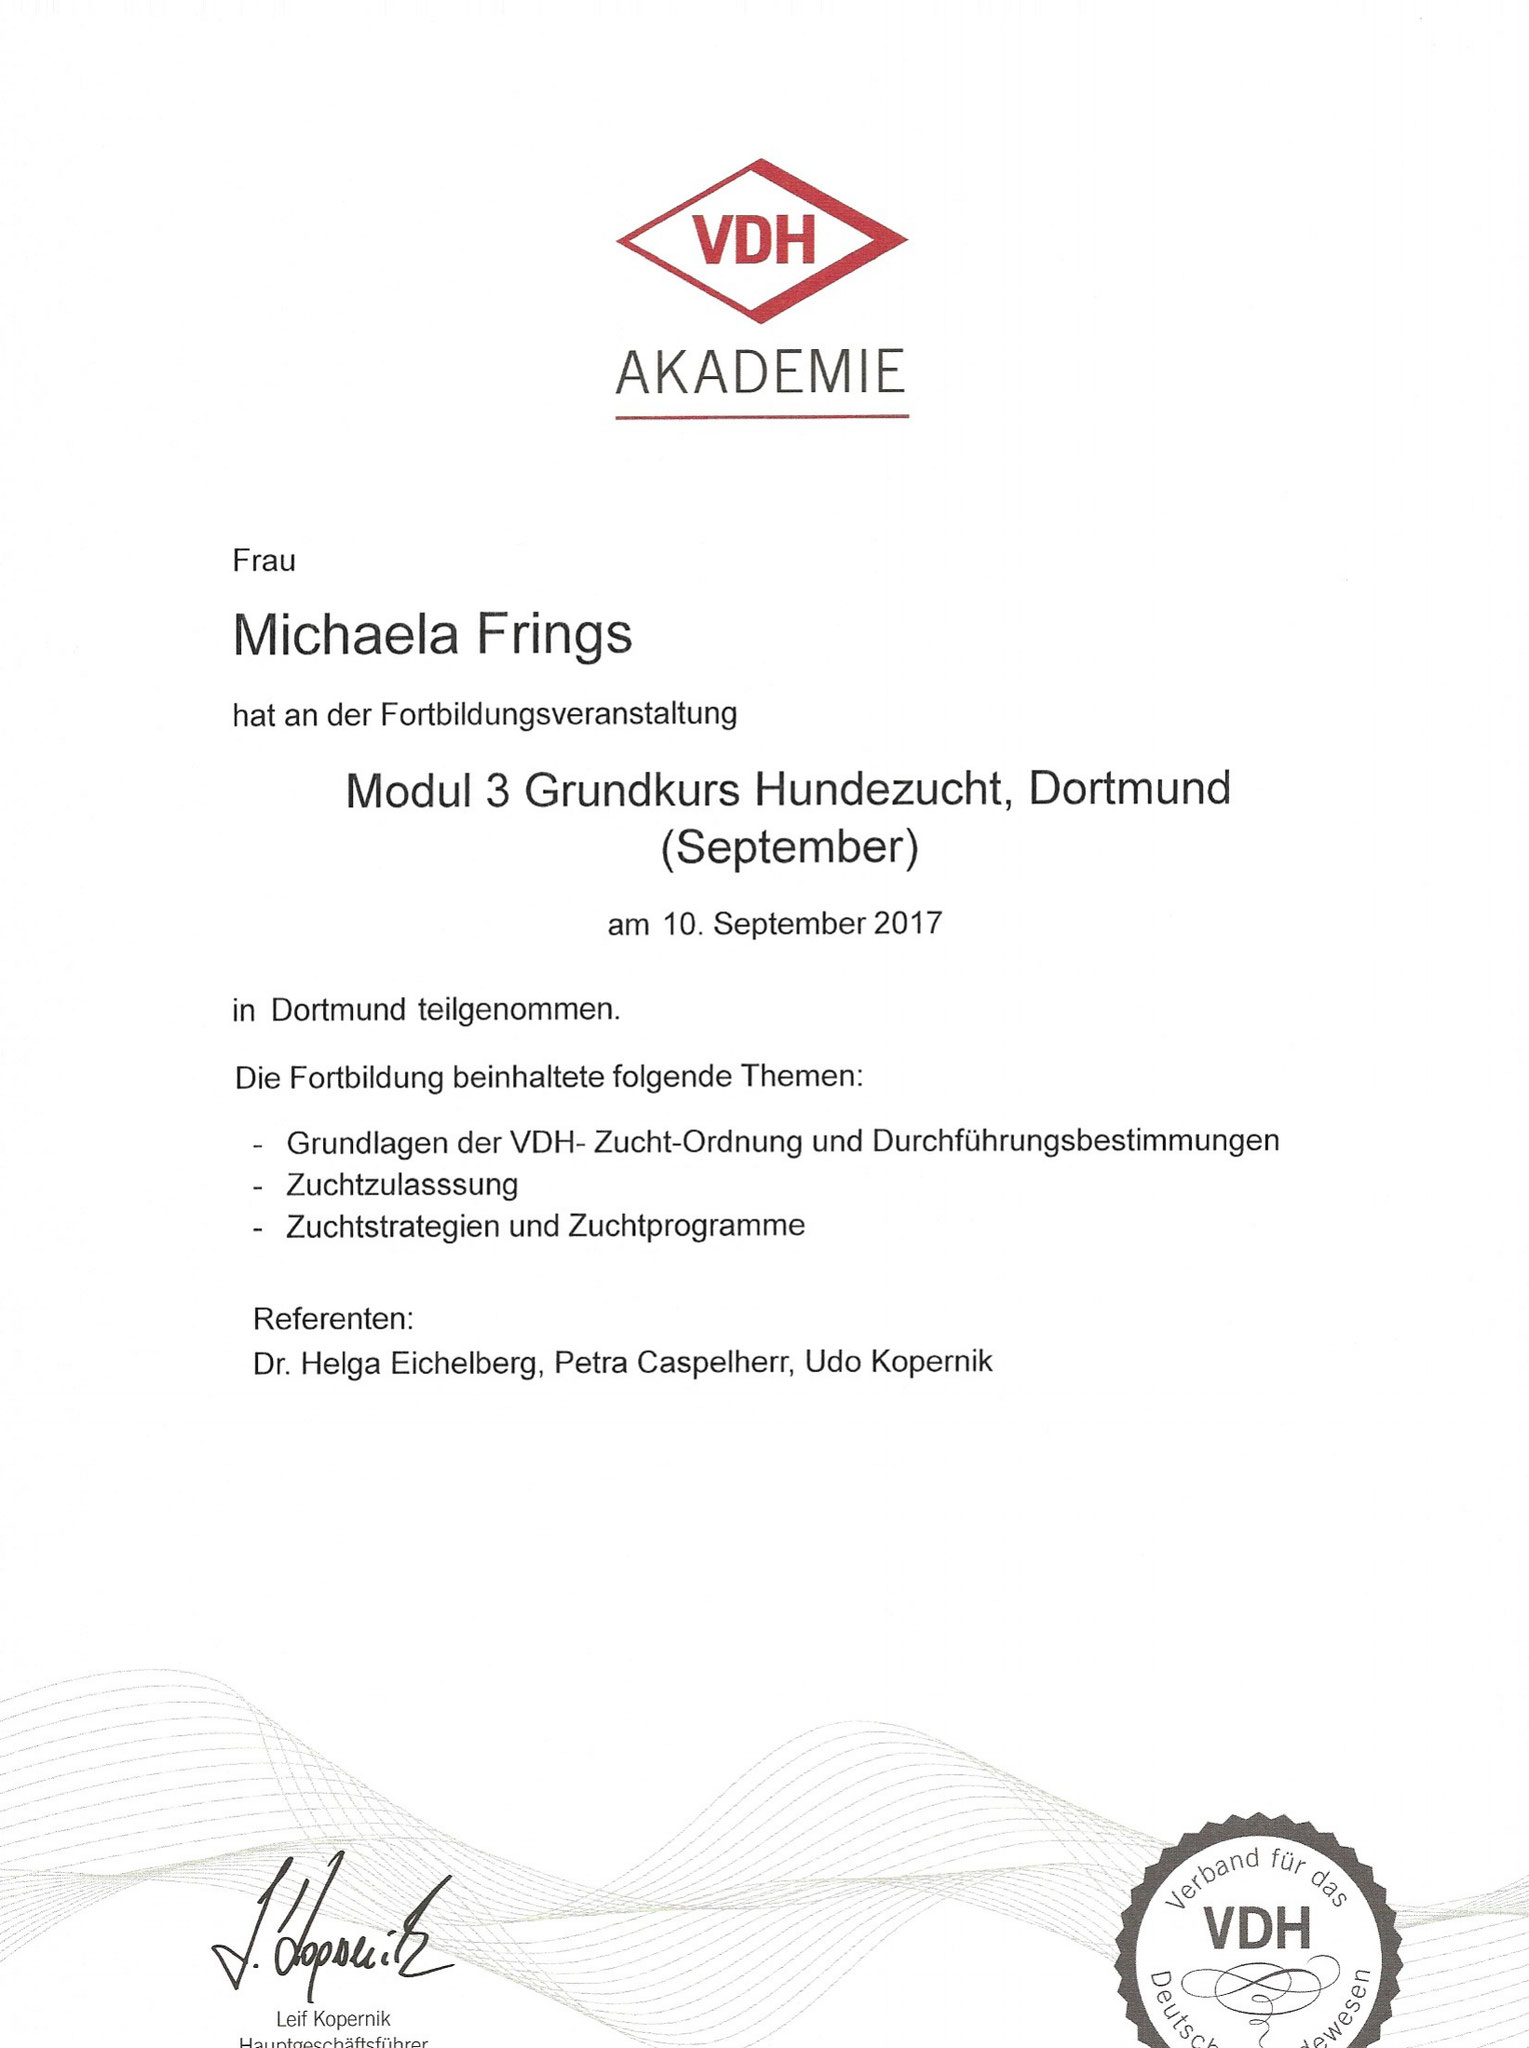 Kynologischer Basiskurs Modul 3 Hundezucht 09. September 2017